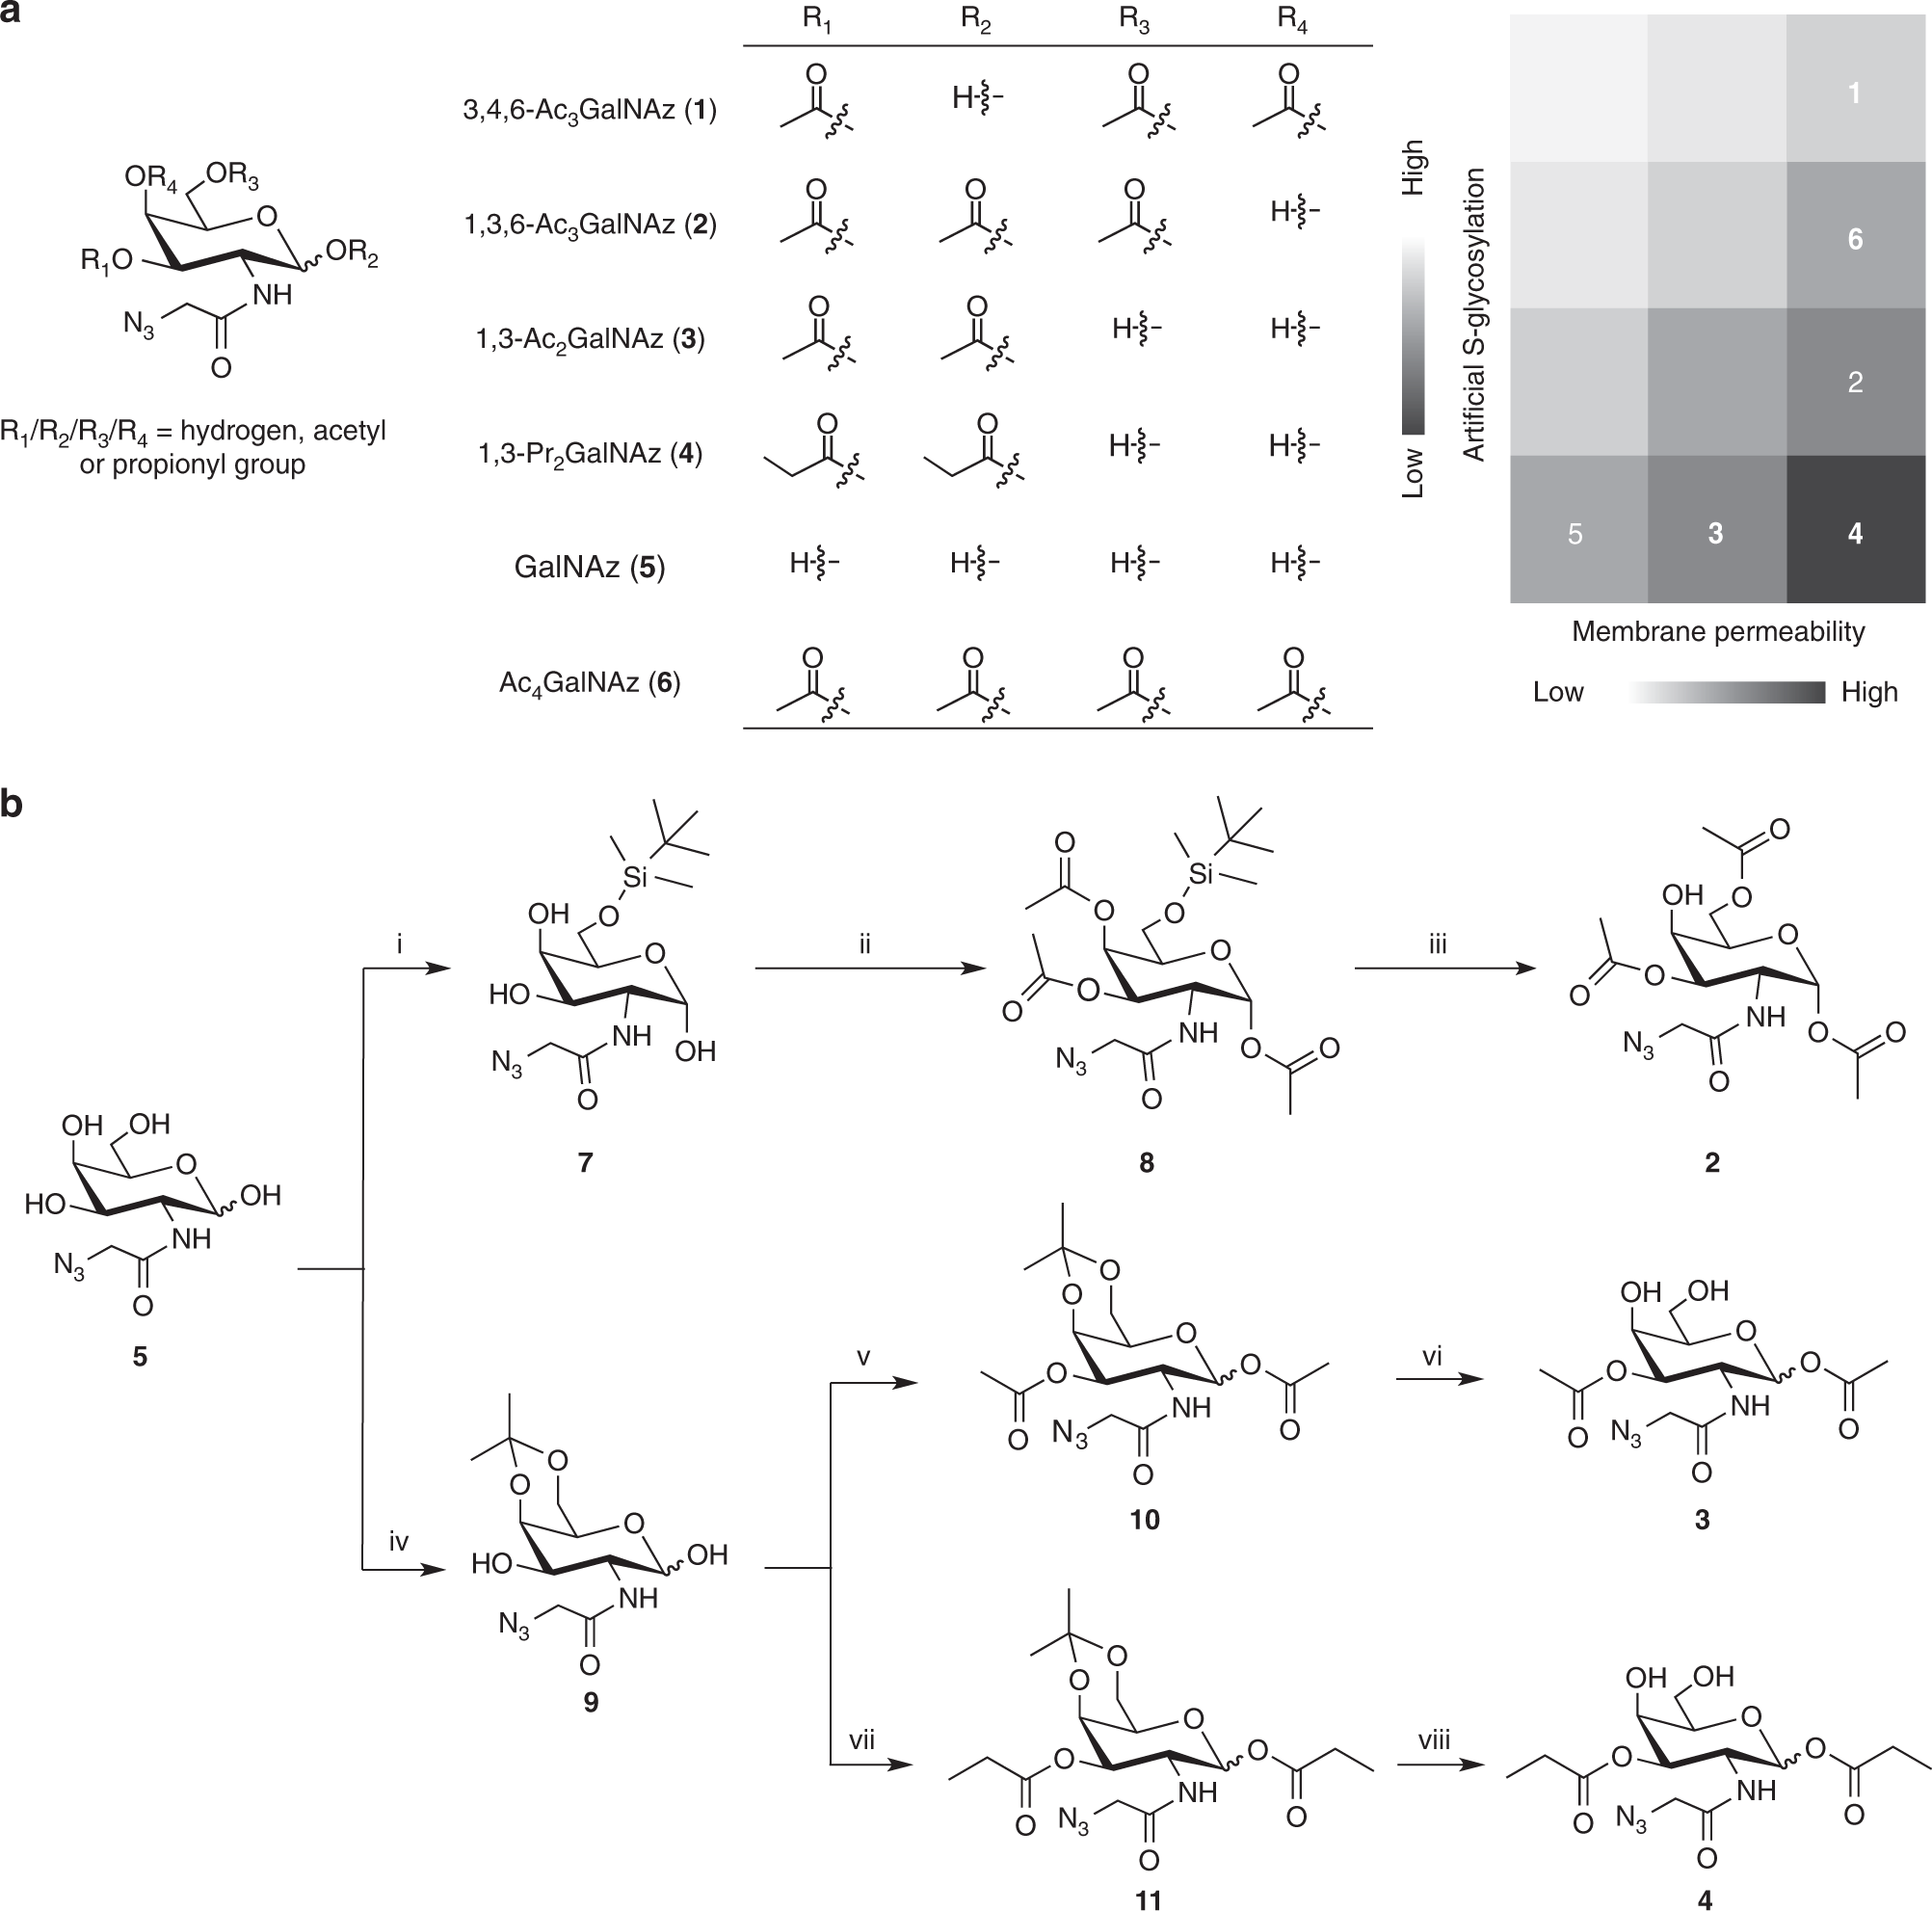 Next-generation unnatural monosaccharides reveal that ESRRB